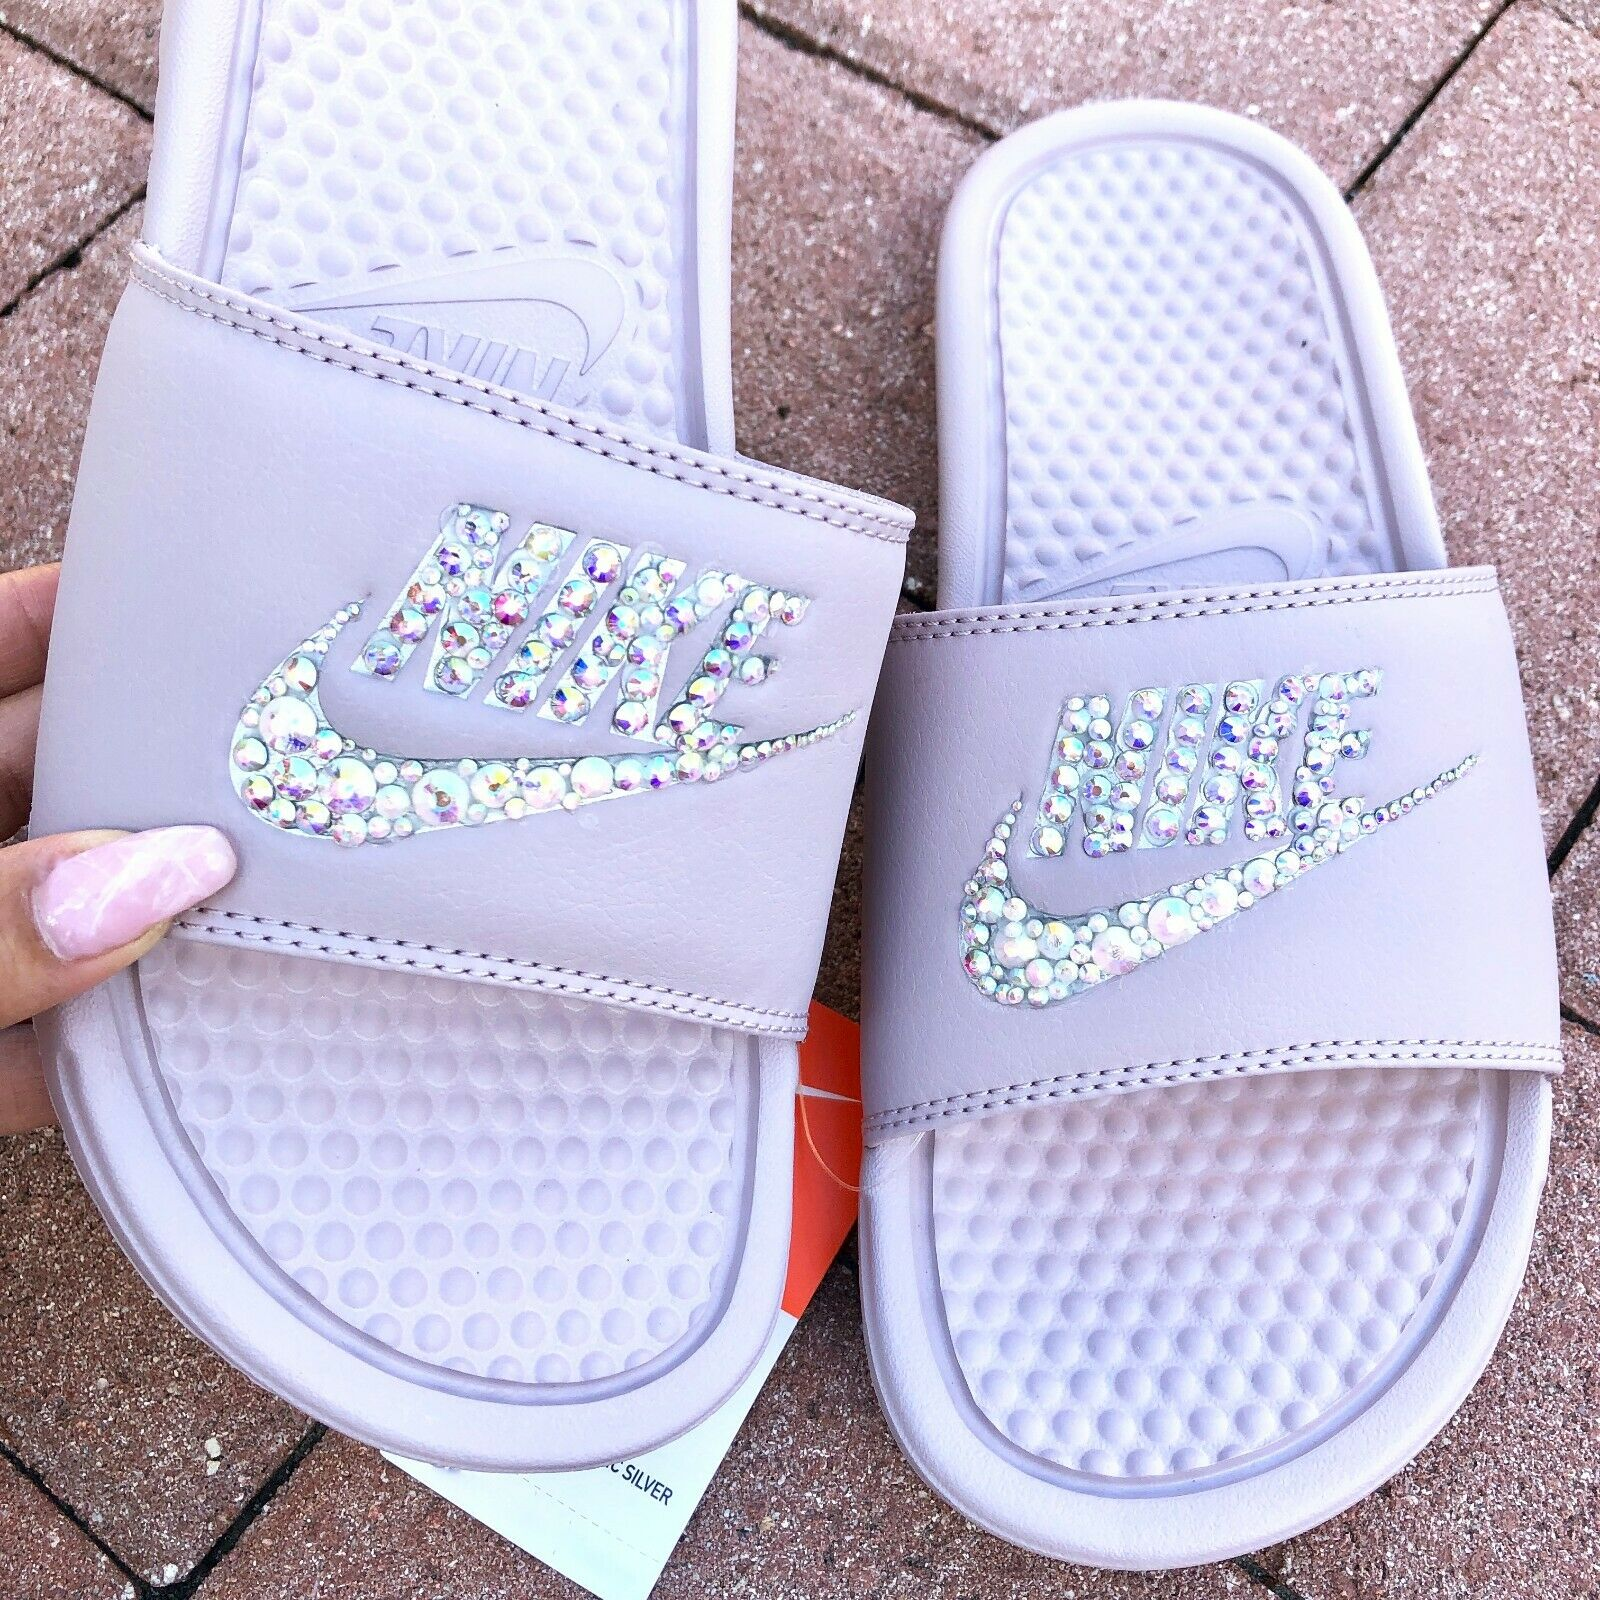 NWT Nike Womens Slides Sandals Swarovski Crystal Bling Bedazzled bluesh Size 11